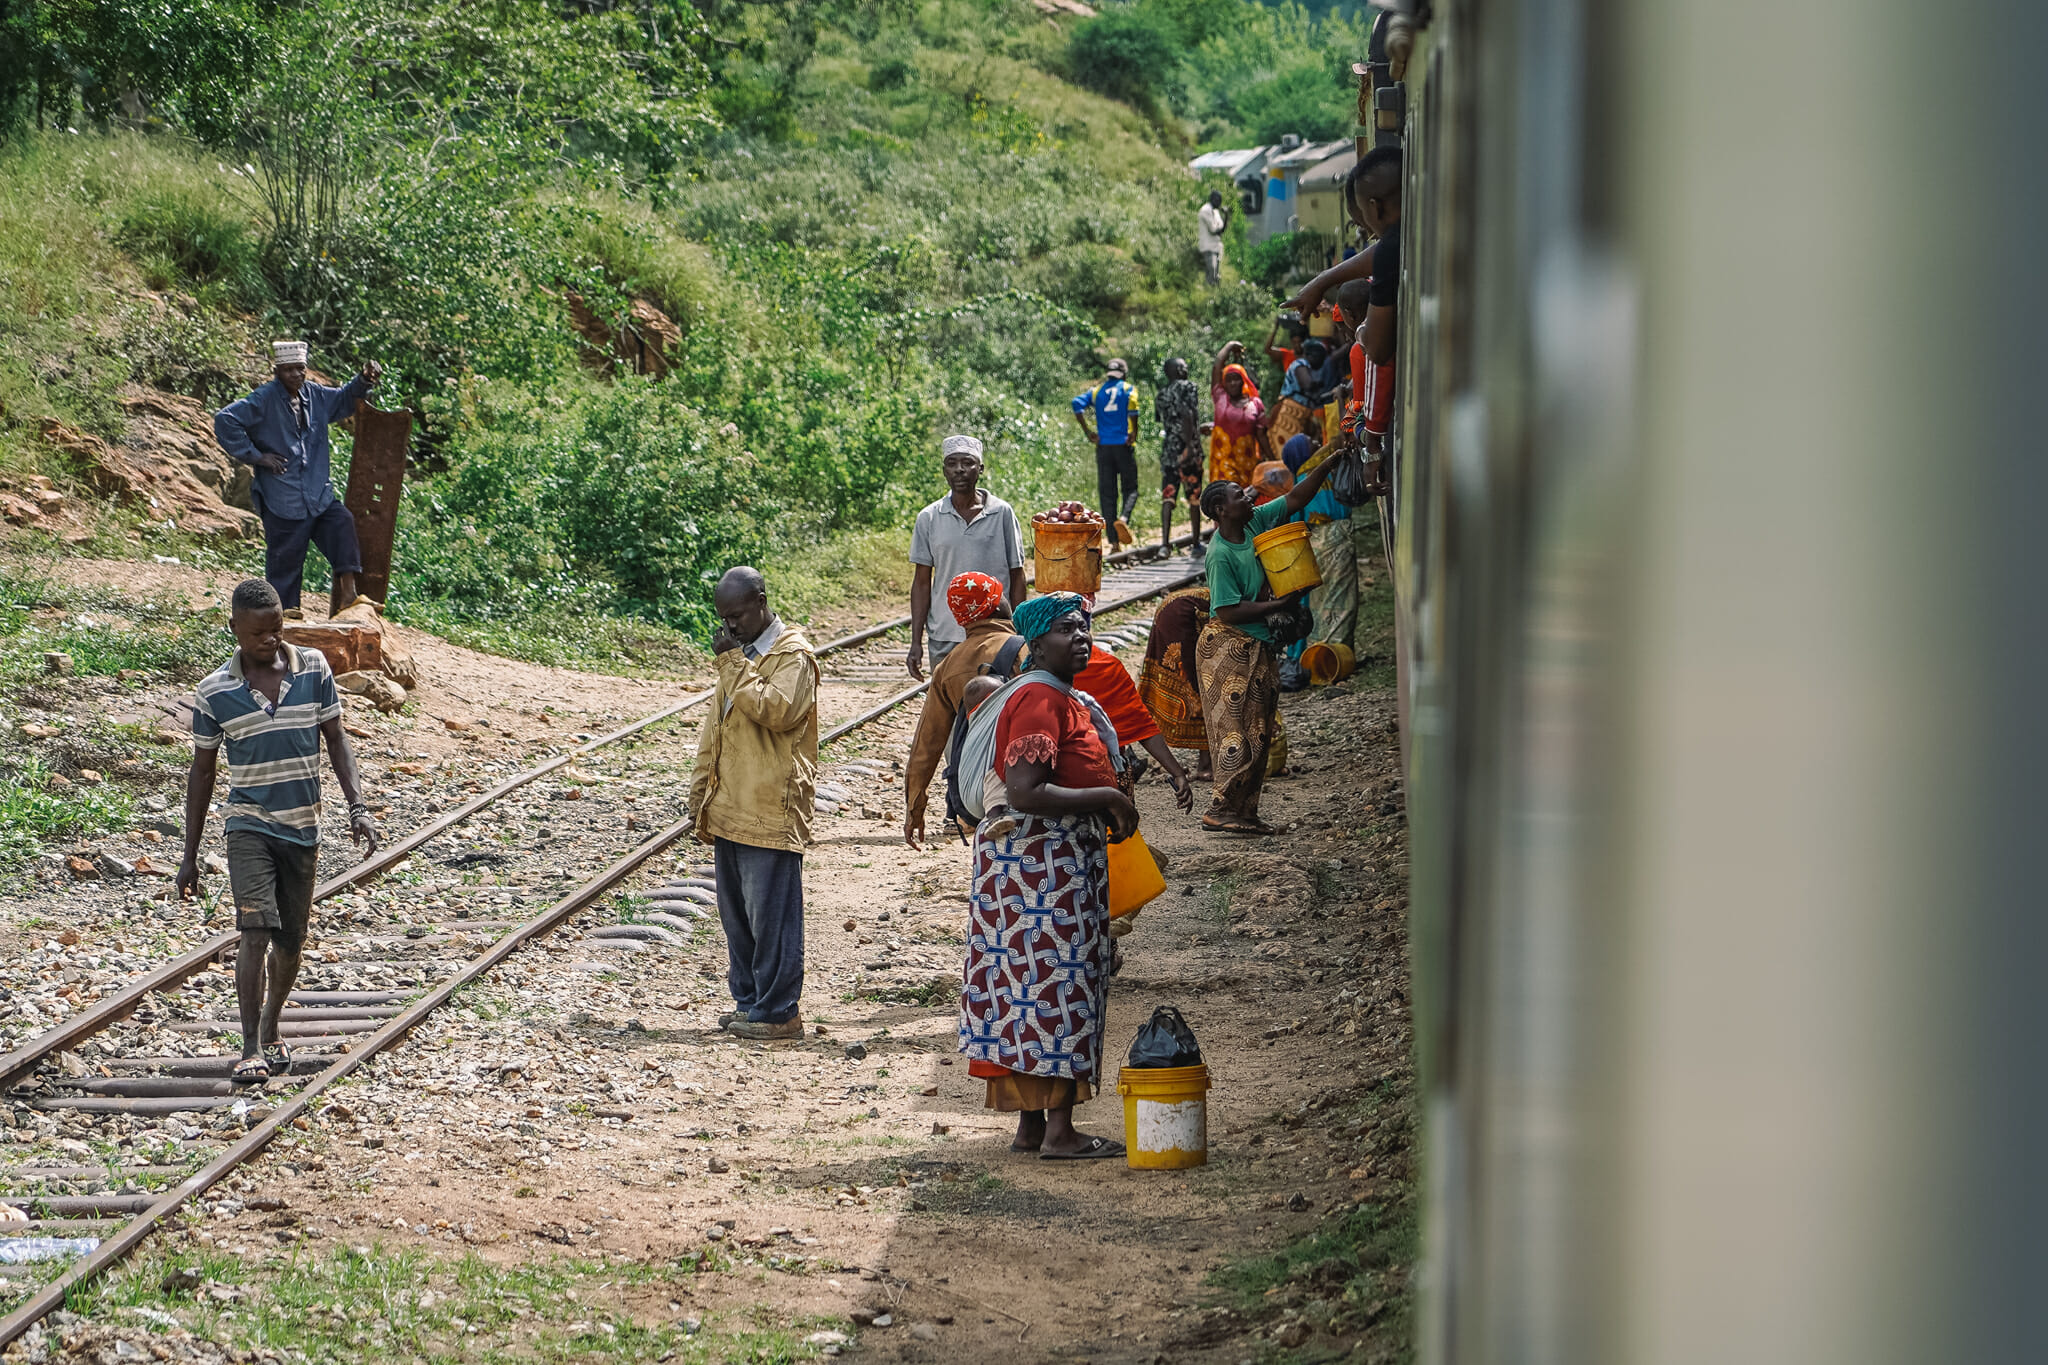 voyage-train-tanzanie-vendeurs